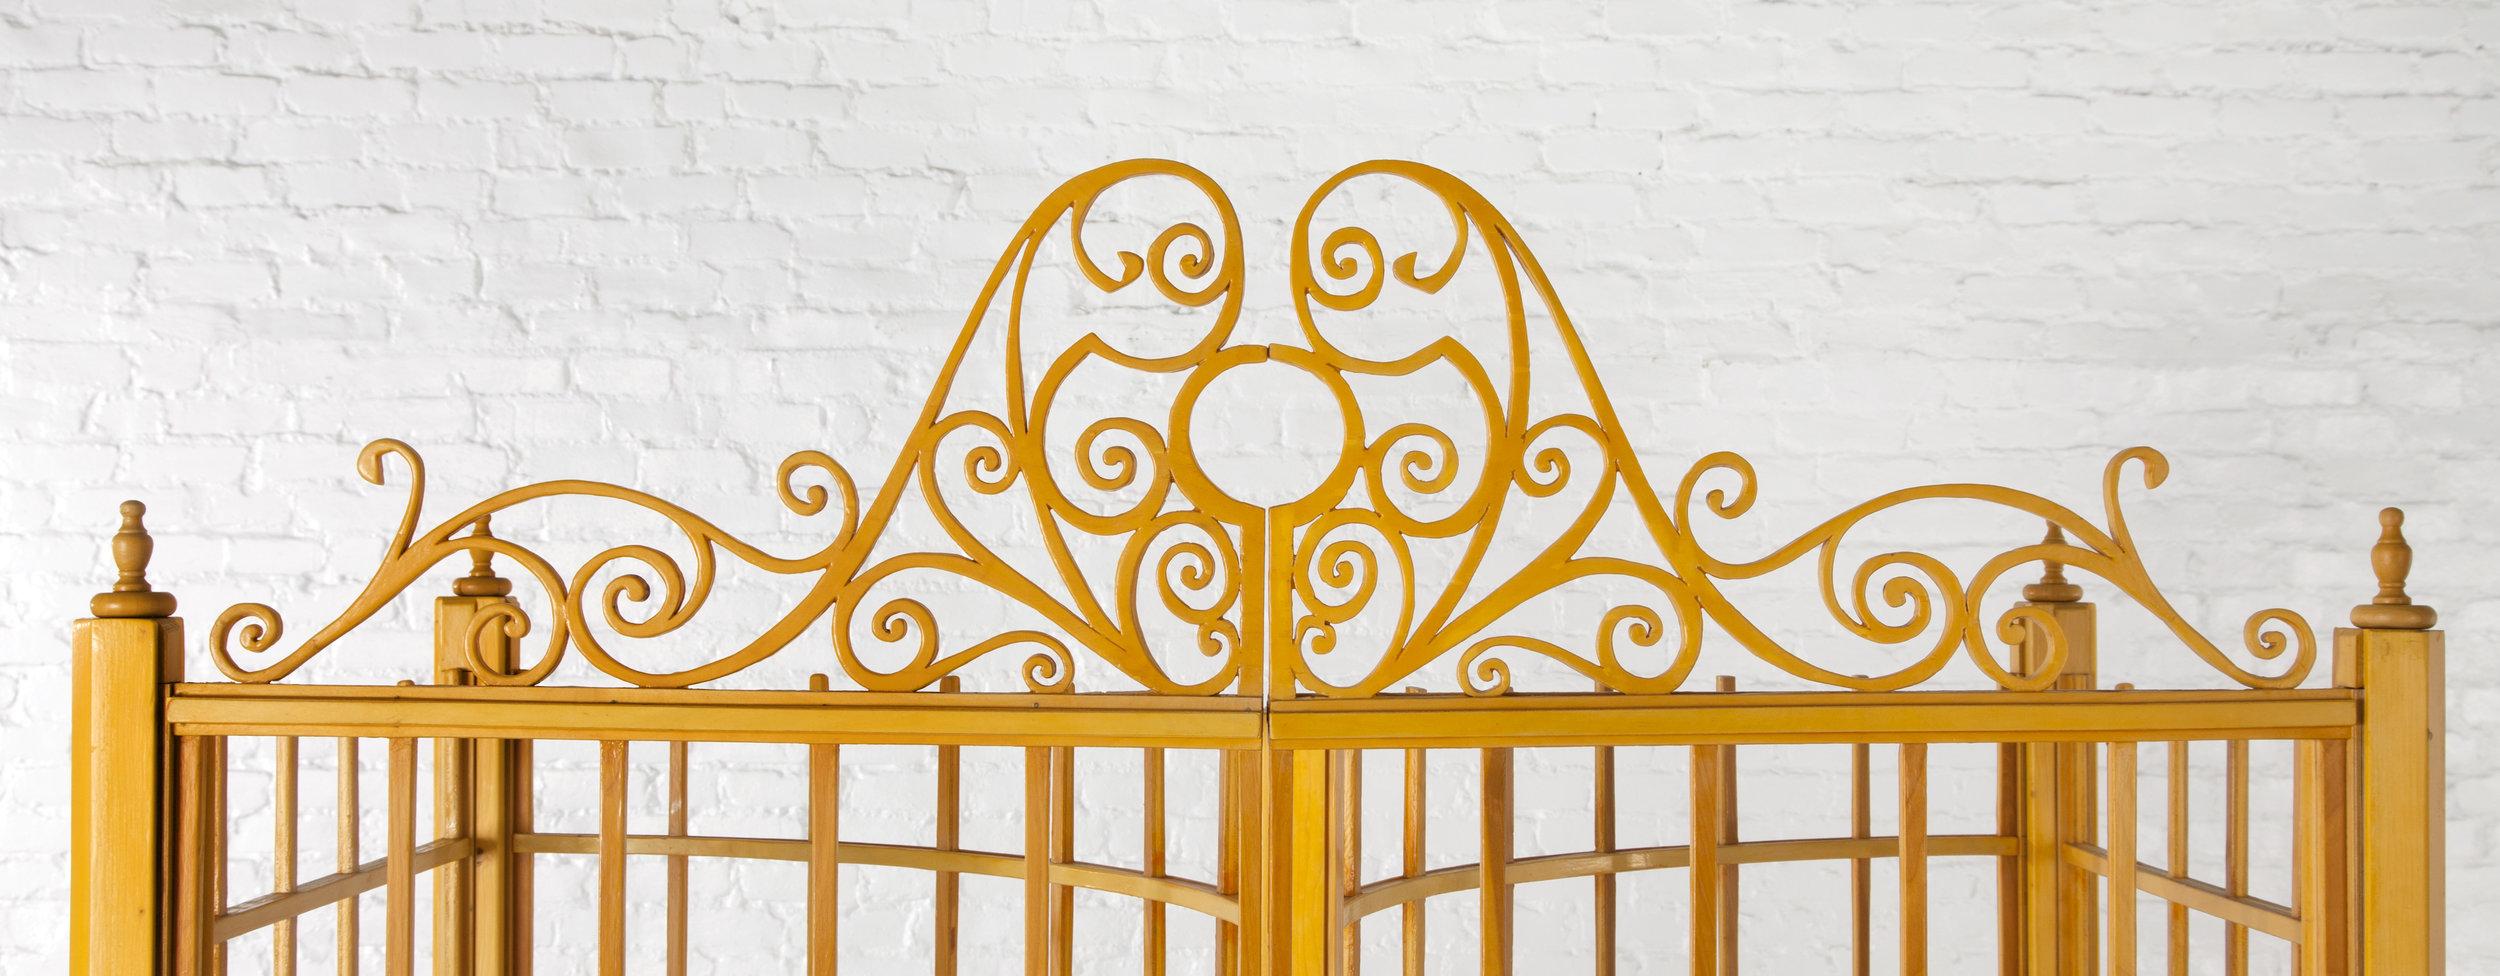 Gate_detail_5.jpg